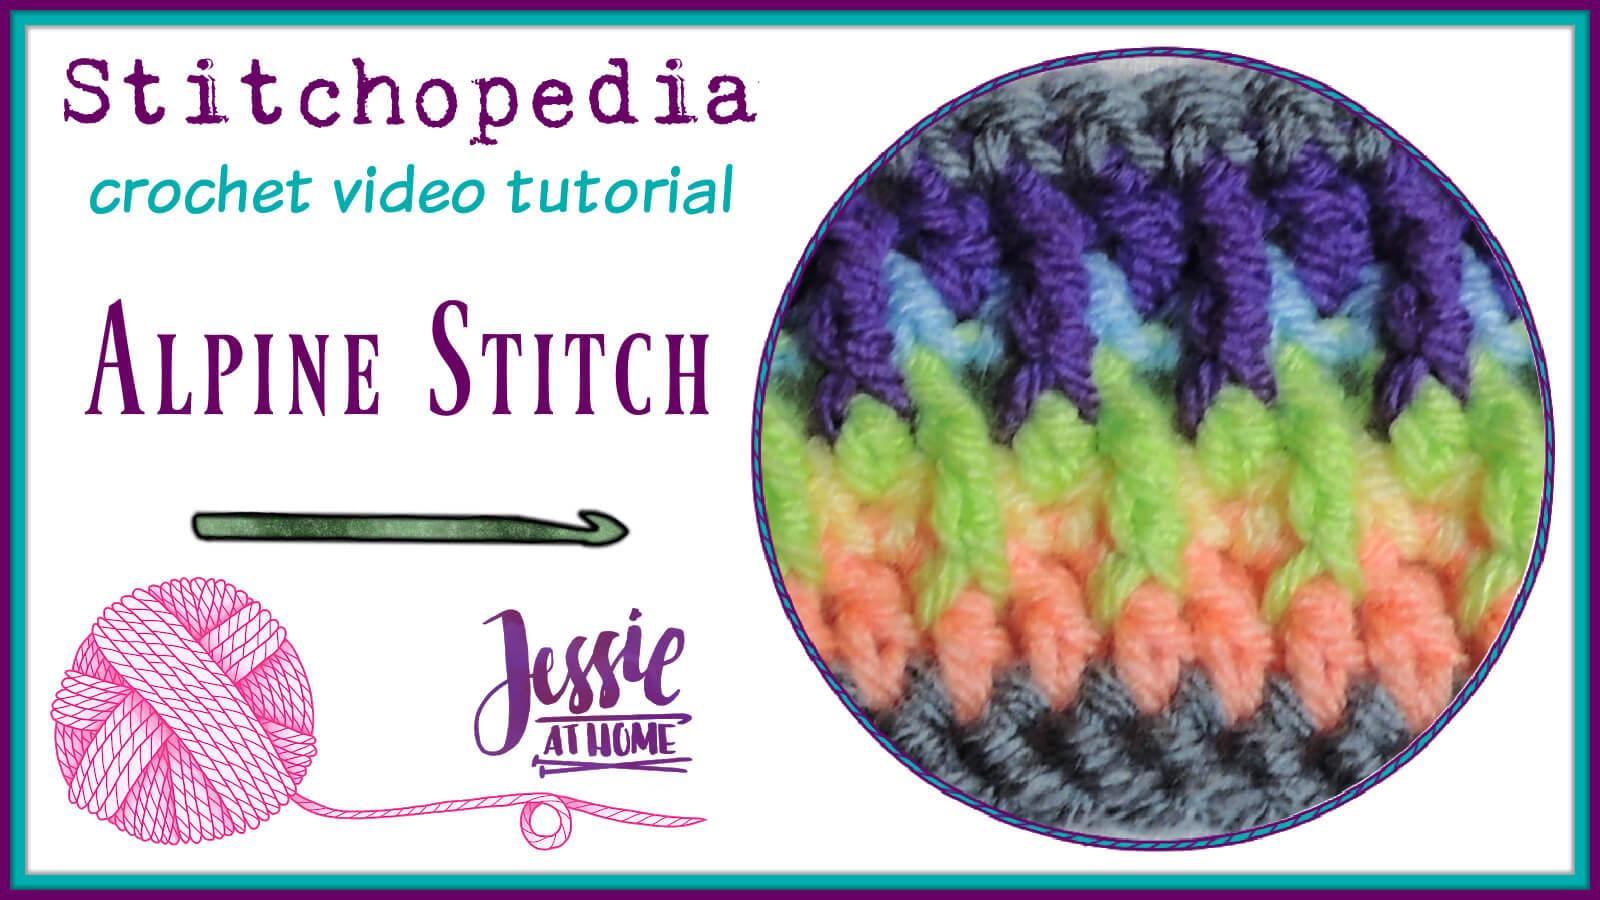 Alpine Stitch Stitchopedia Crochet Video Tutorial - Cover